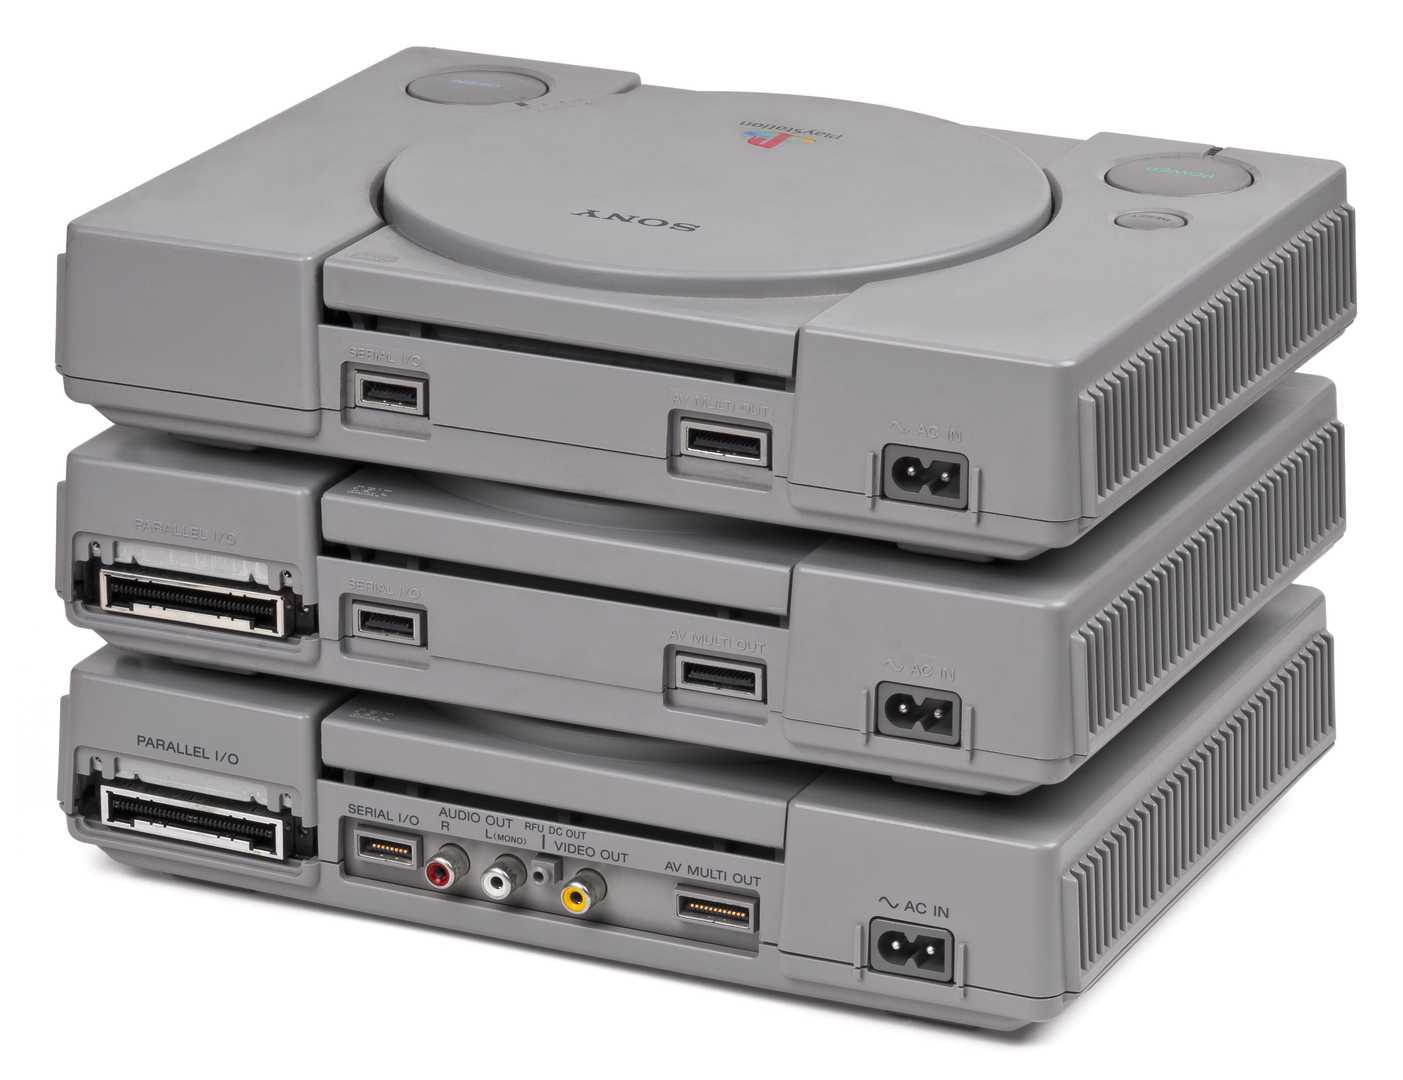 Evoluce v praxi: tři verze Sony PlayStation, zdola nahoru SCPH-1001, SCPH-5001 a SCPH-9001